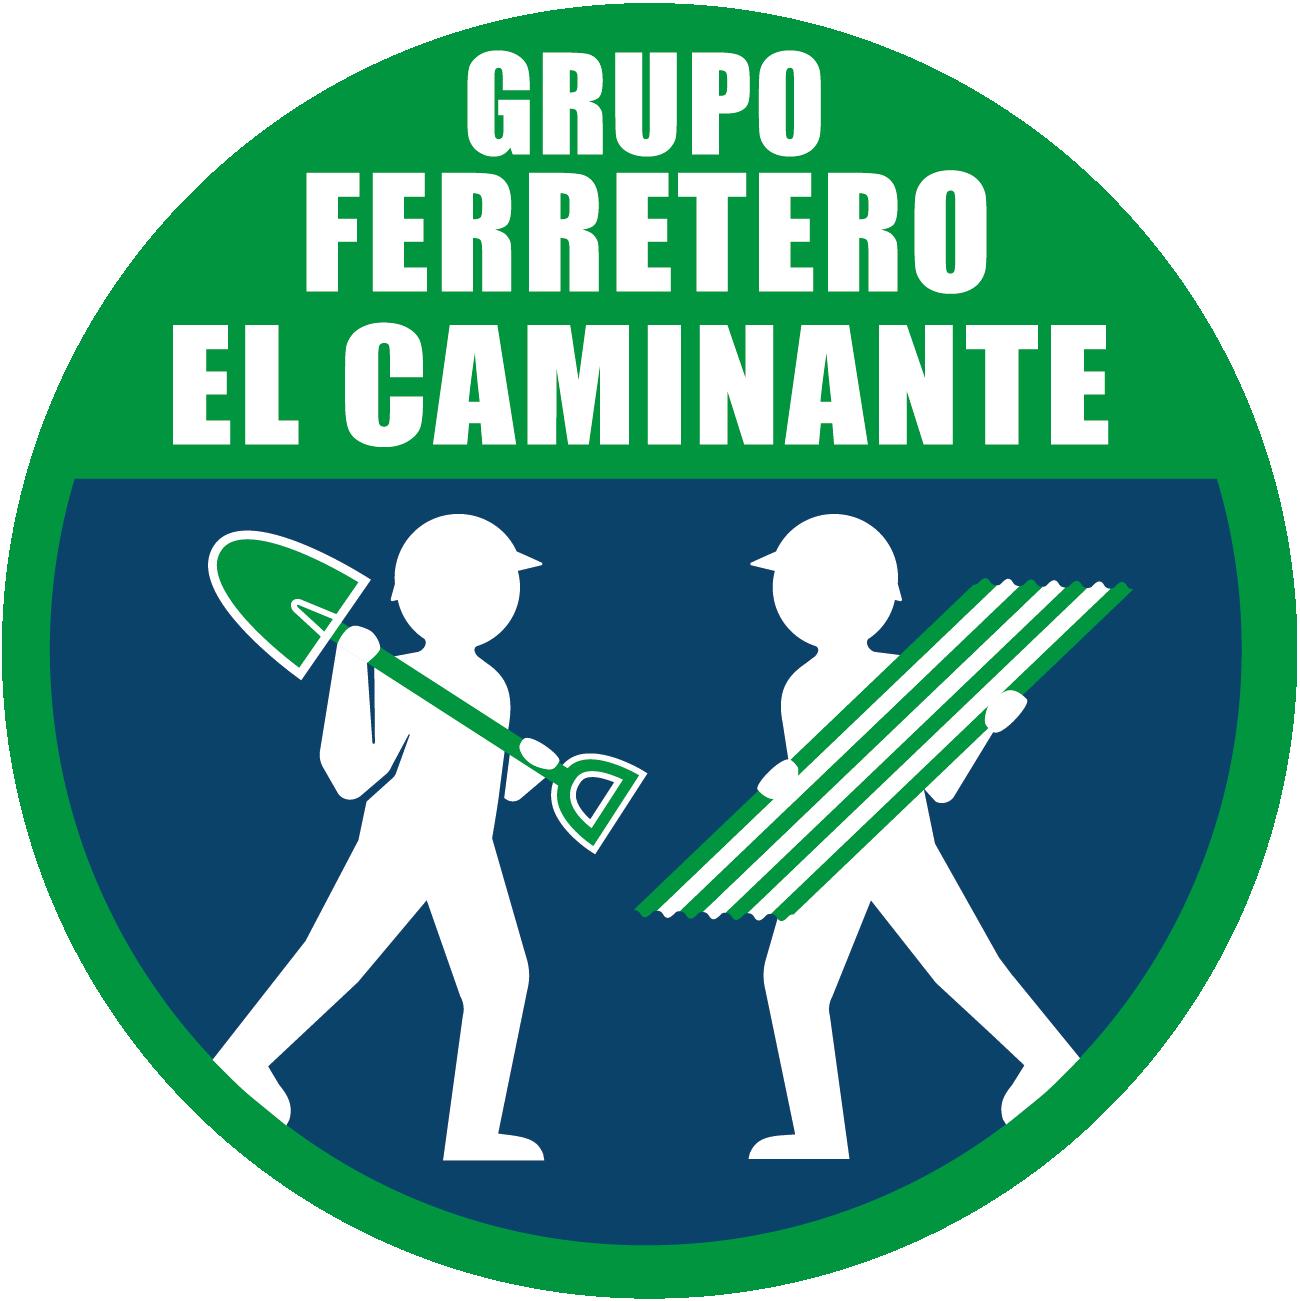 Grupo Ferretero El Caminante